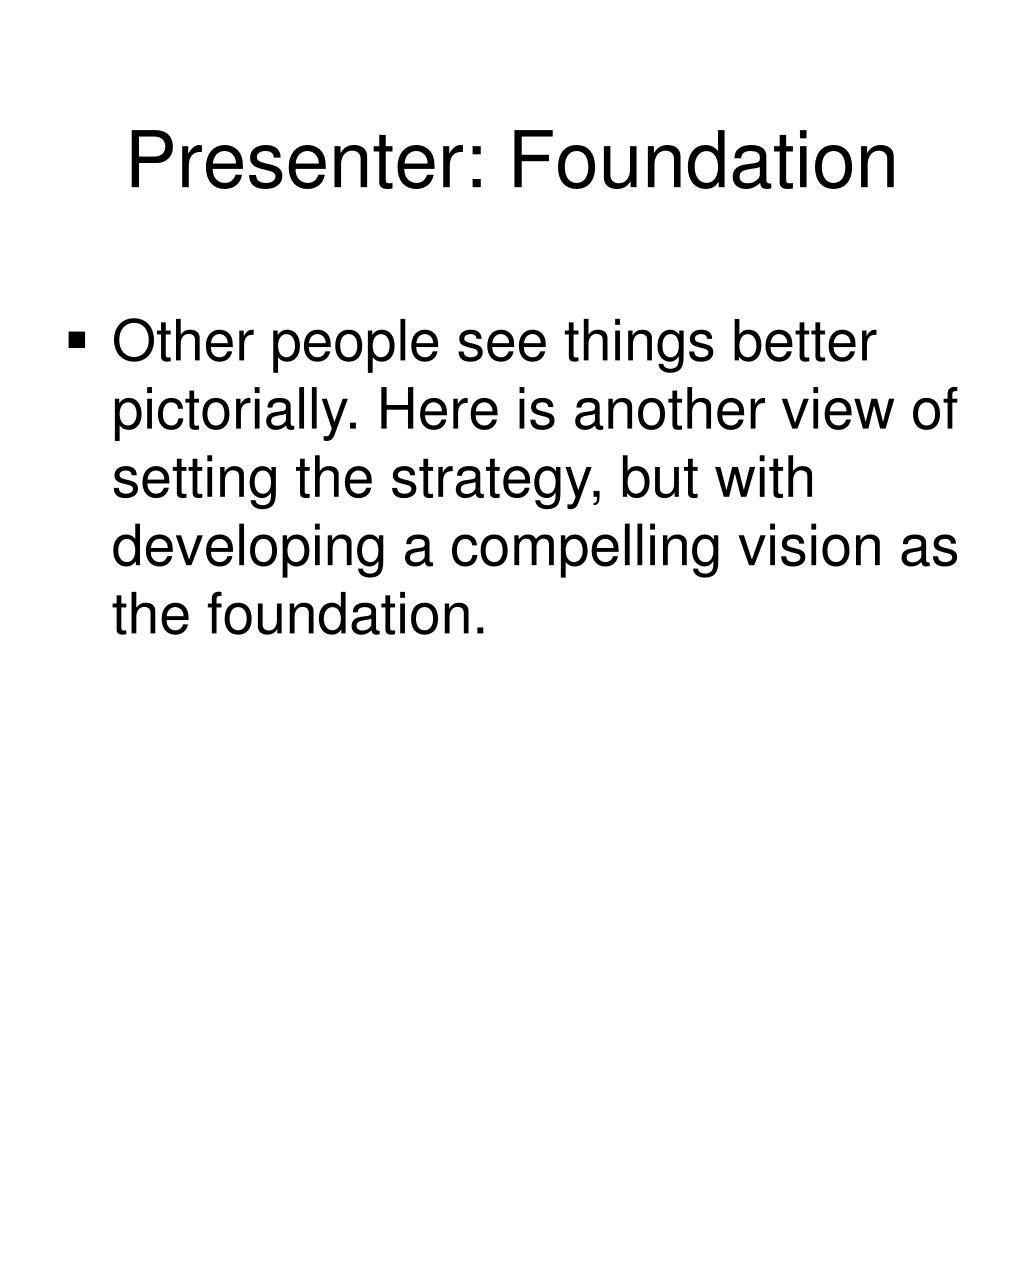 Presenter: Foundation